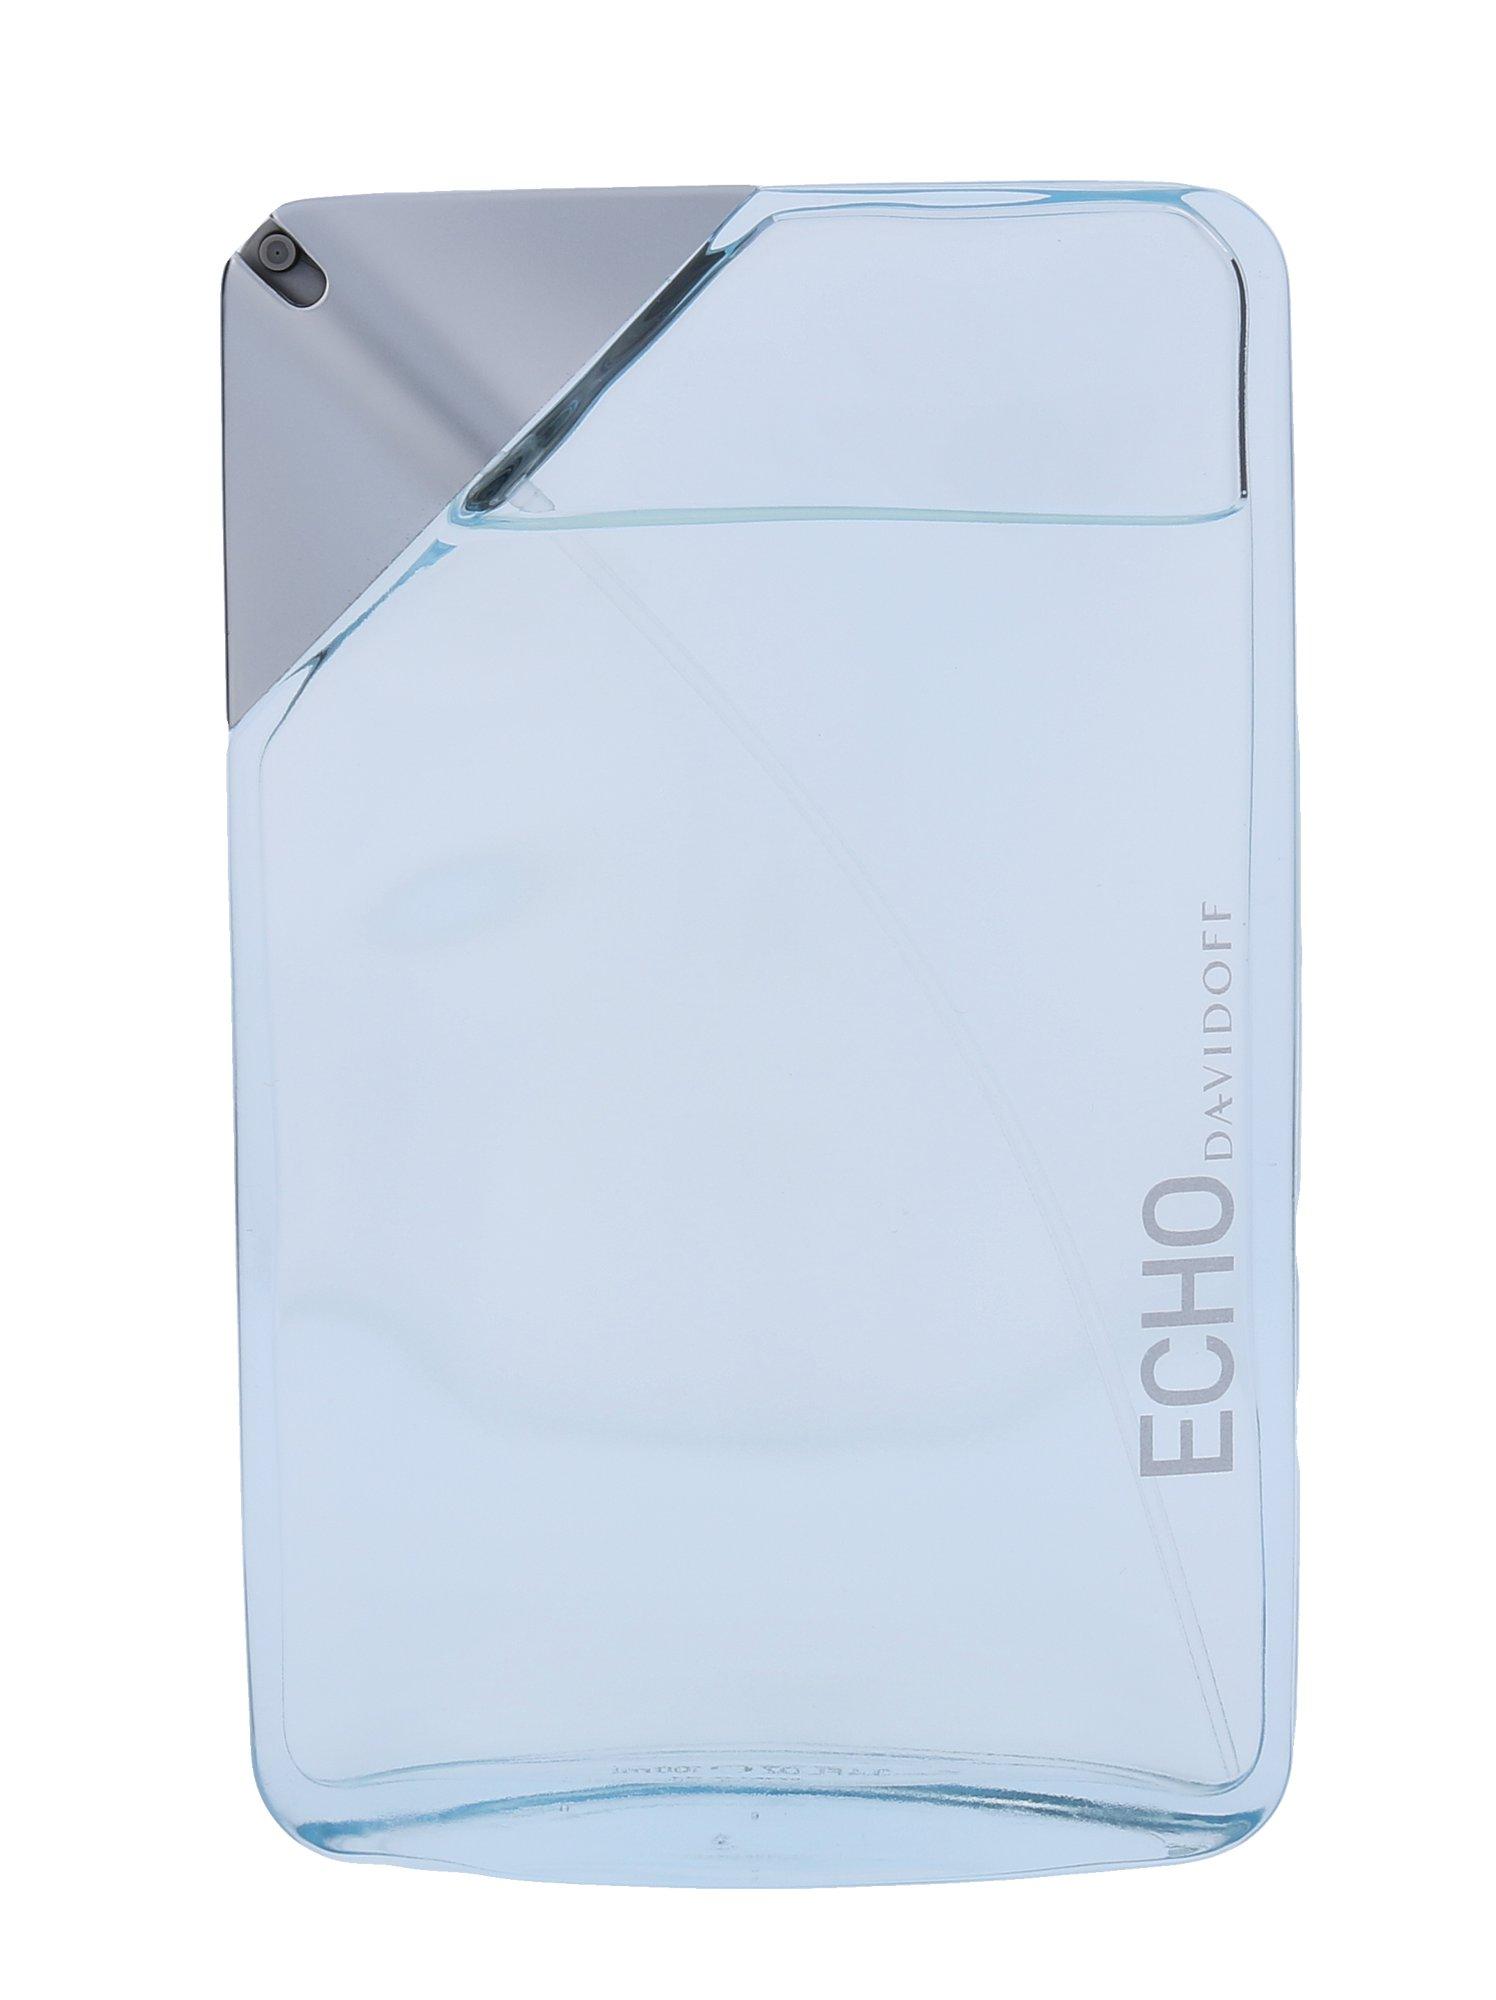 Davidoff Echo for Man, edt 100ml